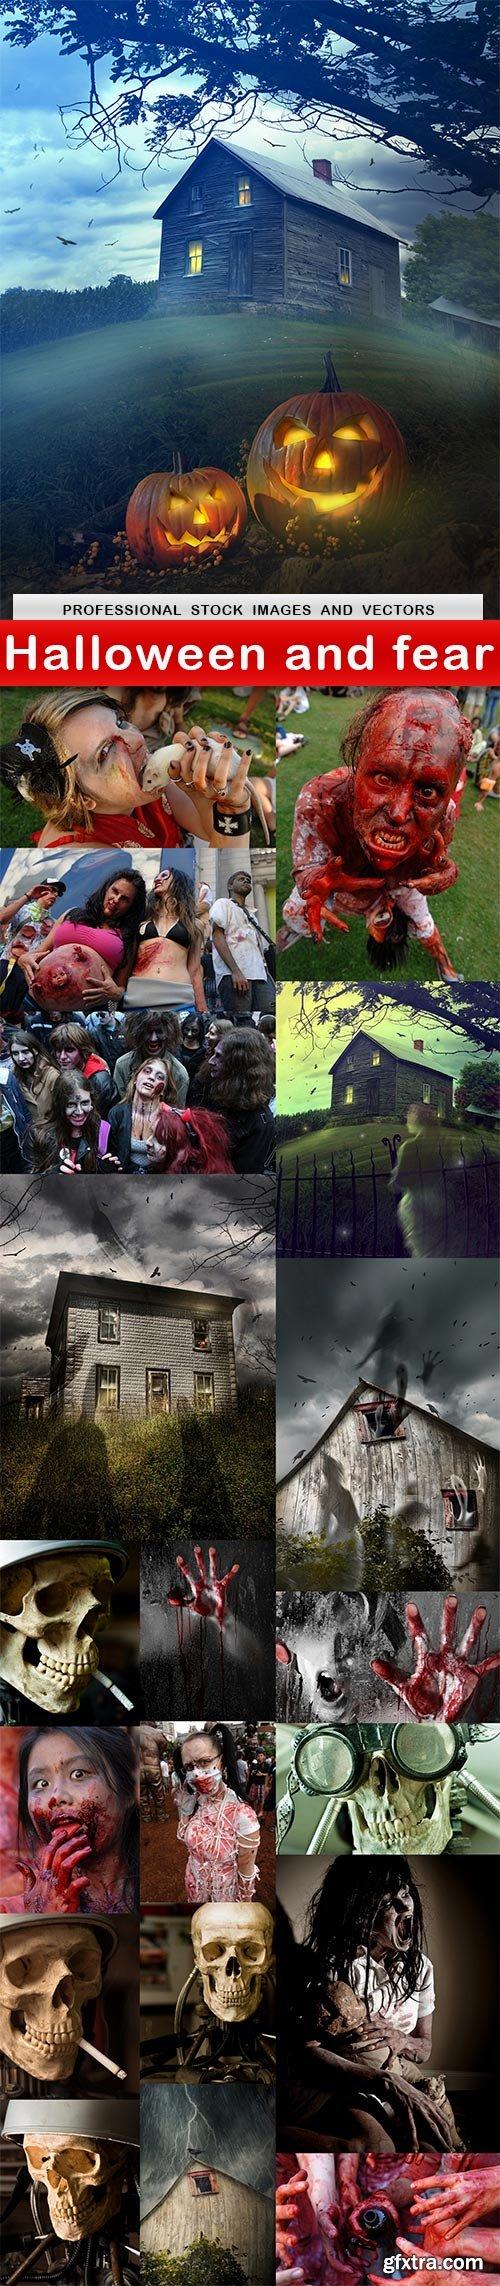 Halloween and fear - 20 UHQ JPEG